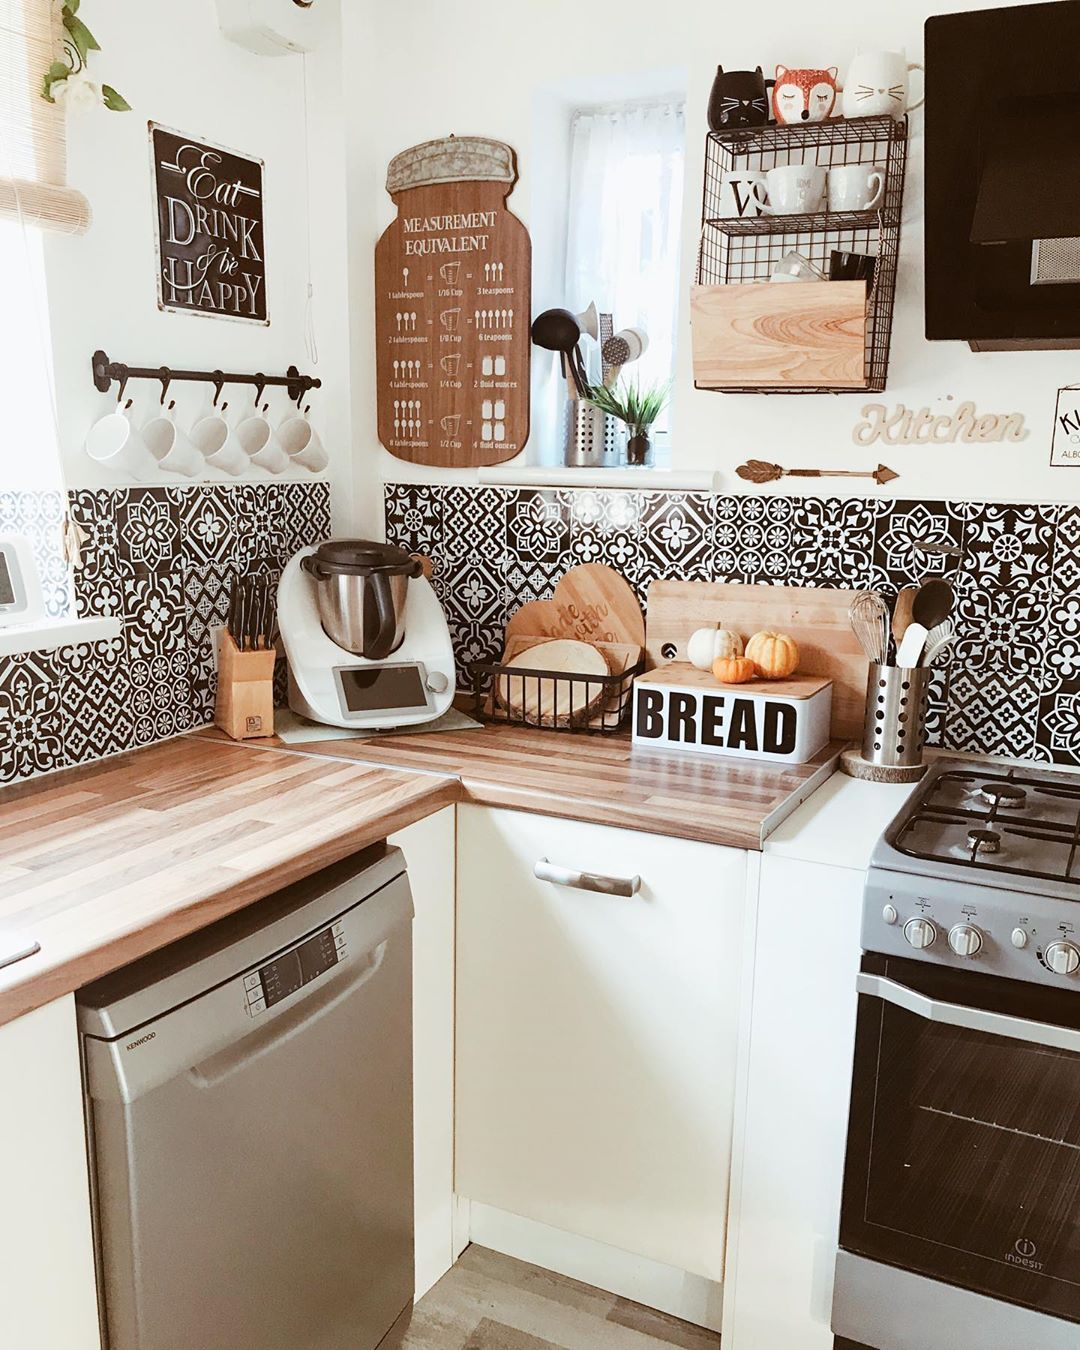 Love The Black And White Pattern Backsplash In This Kitchen Design